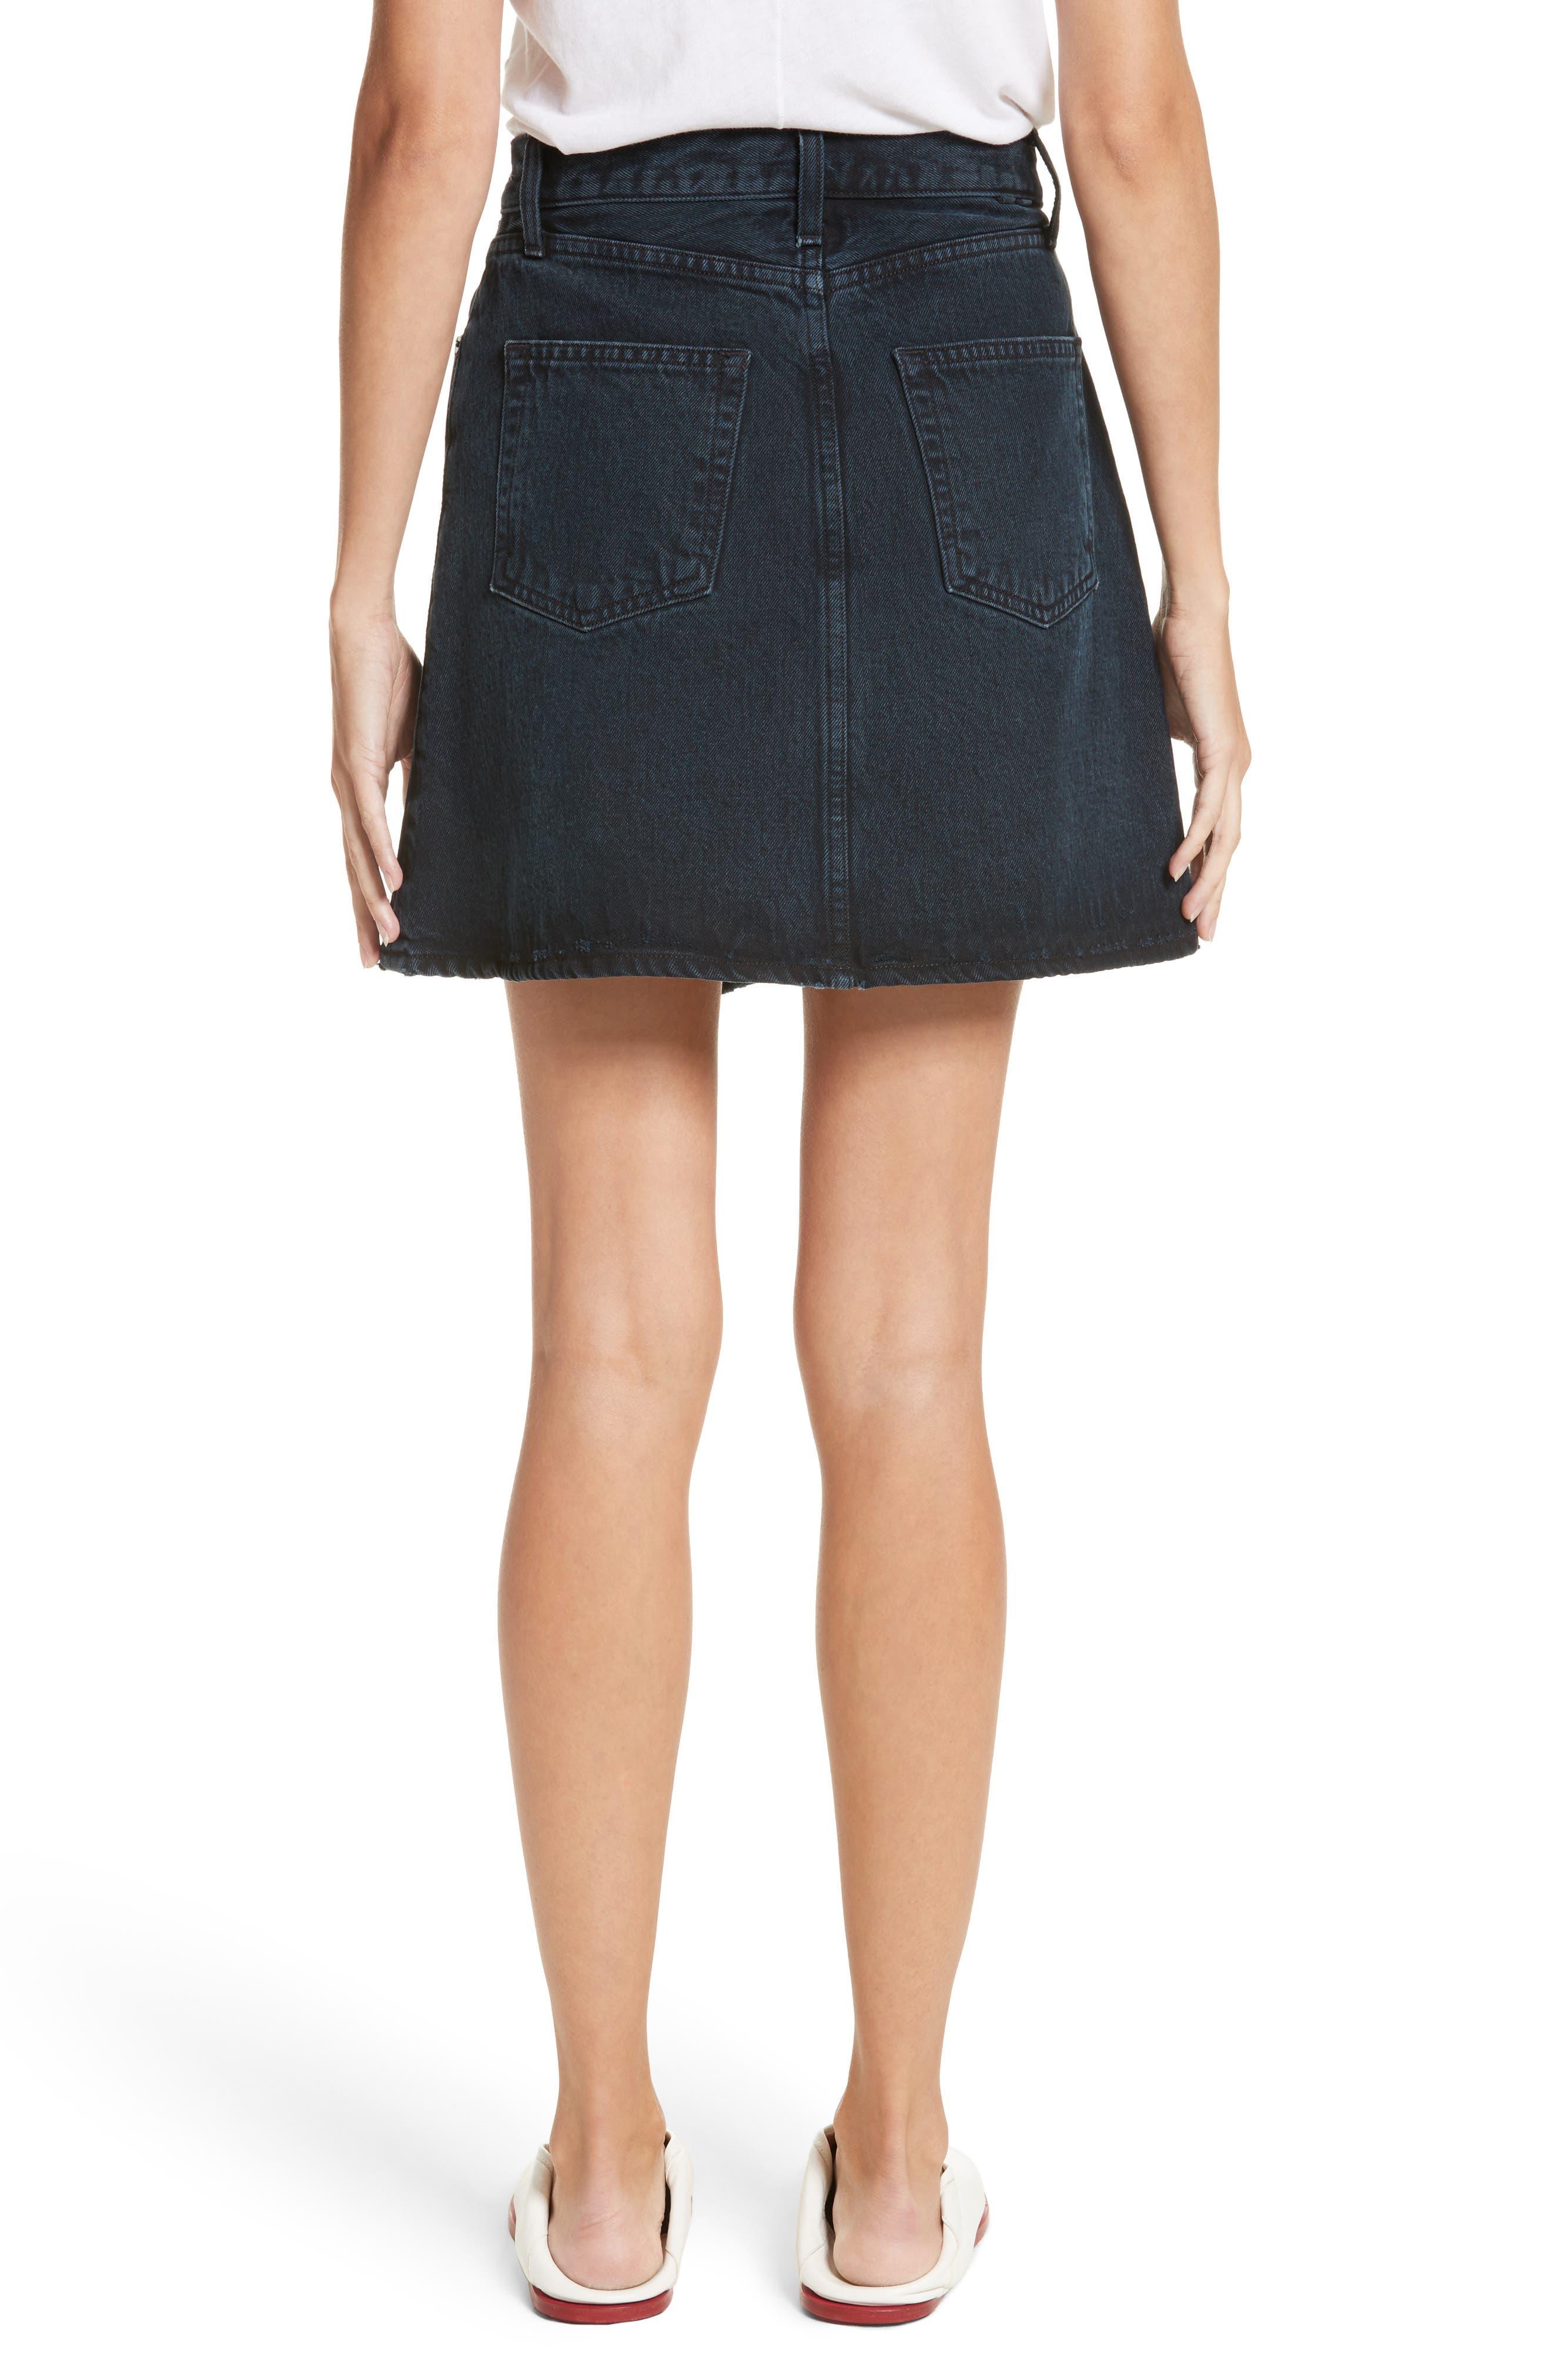 PSWL Folded Denim Skirt,                             Alternate thumbnail 2, color,                             Stone Washed Black